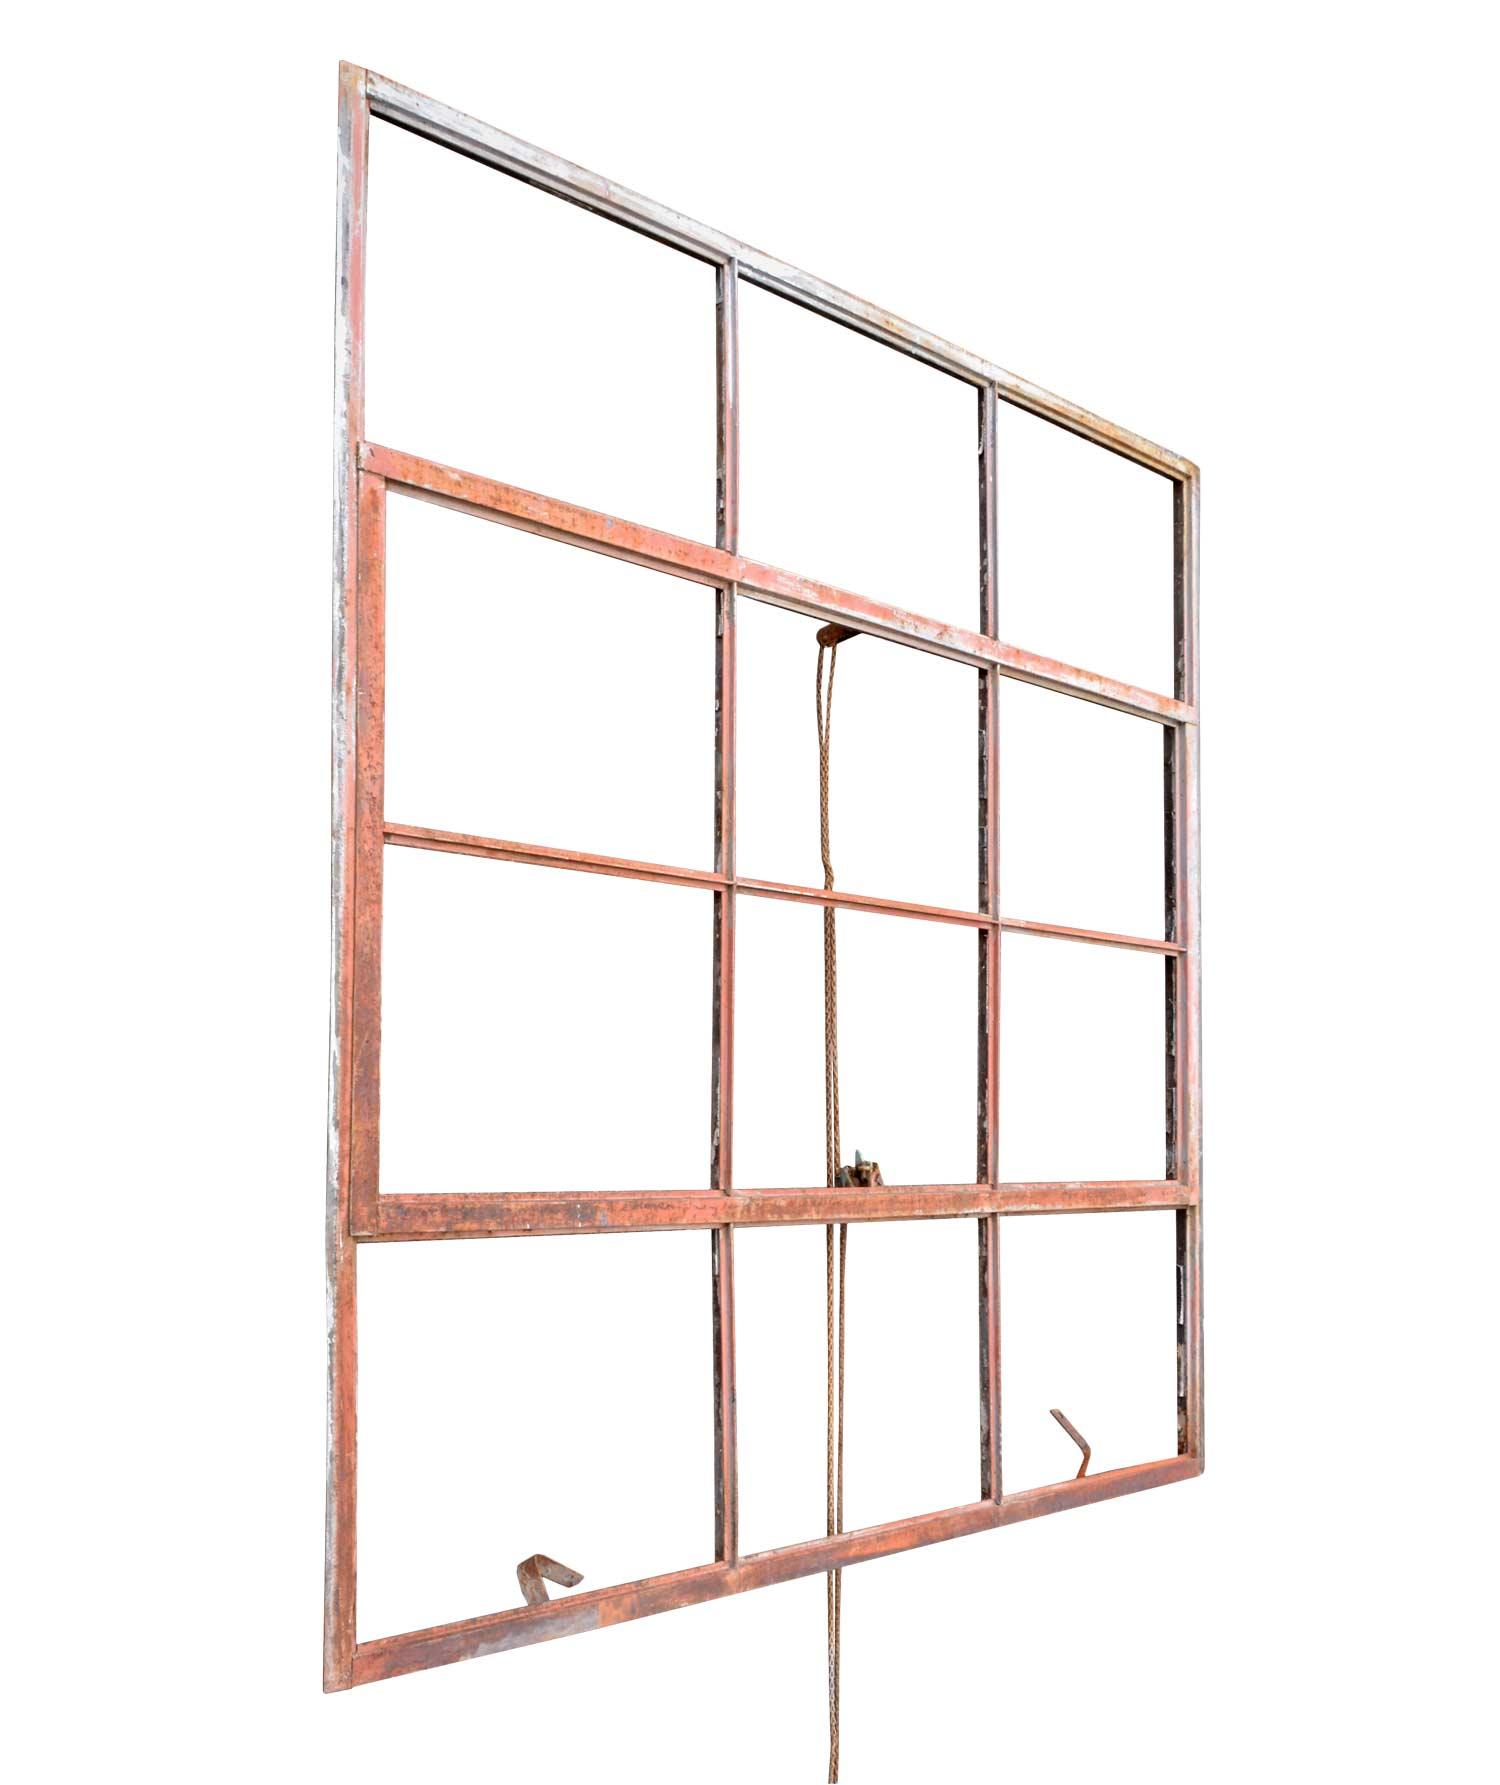 46240-large-iron-warehouse-window-closed.jpg